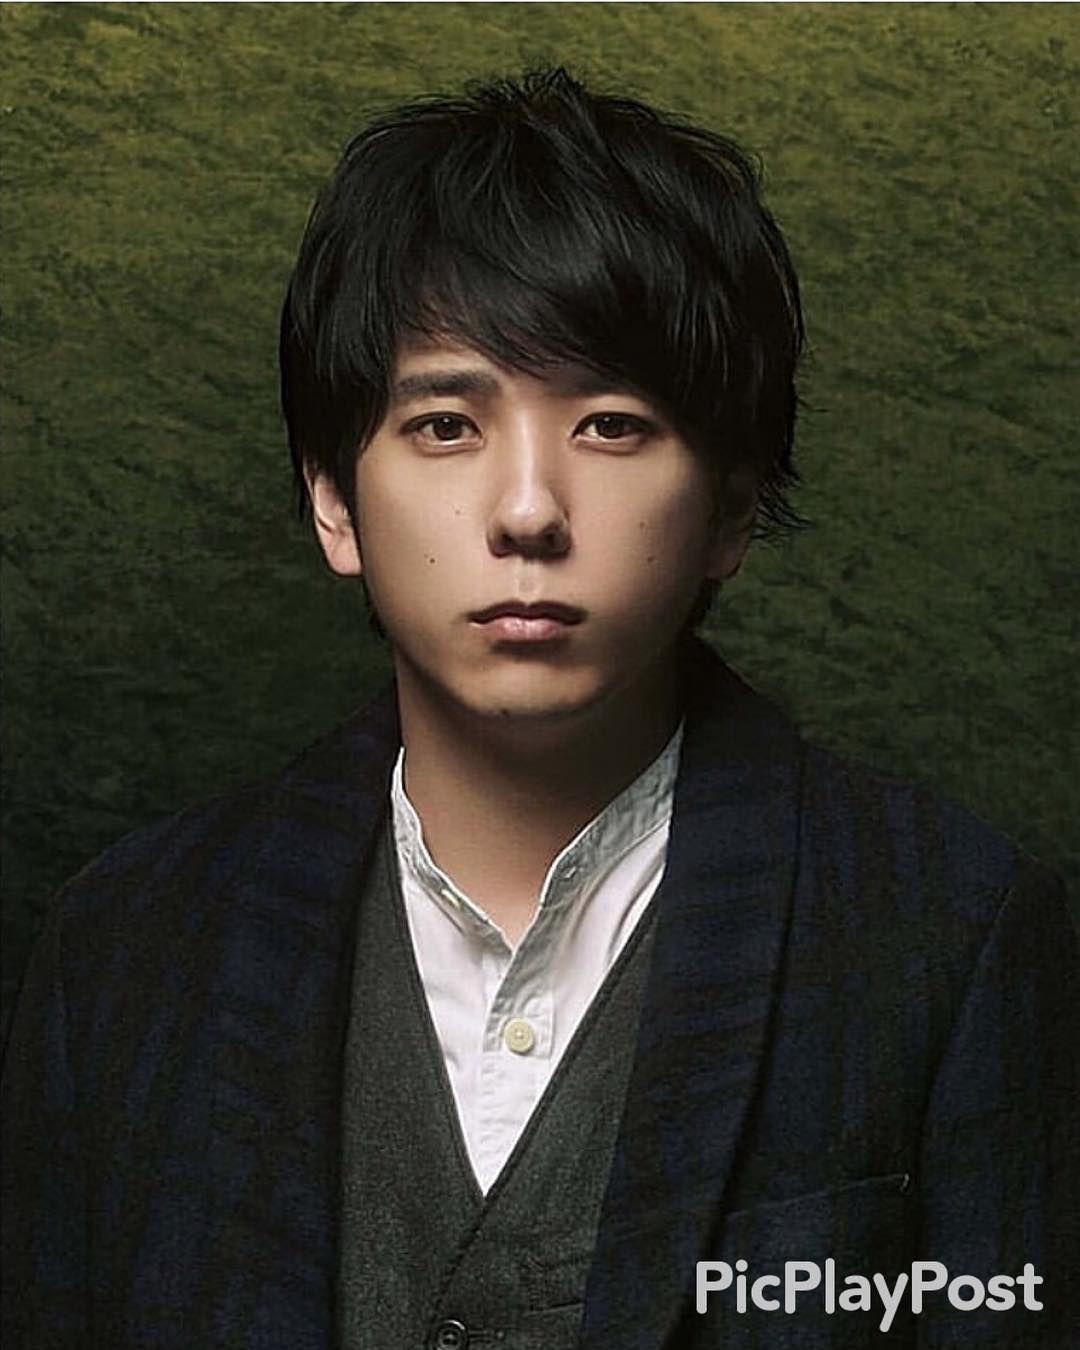 watch the best youtube videos online ニノちゃん 嵐 arashi 二宮和也 kazunarininomiya nice guy cool beauty perfect excellent amazing good イケメン 美男子 playlist